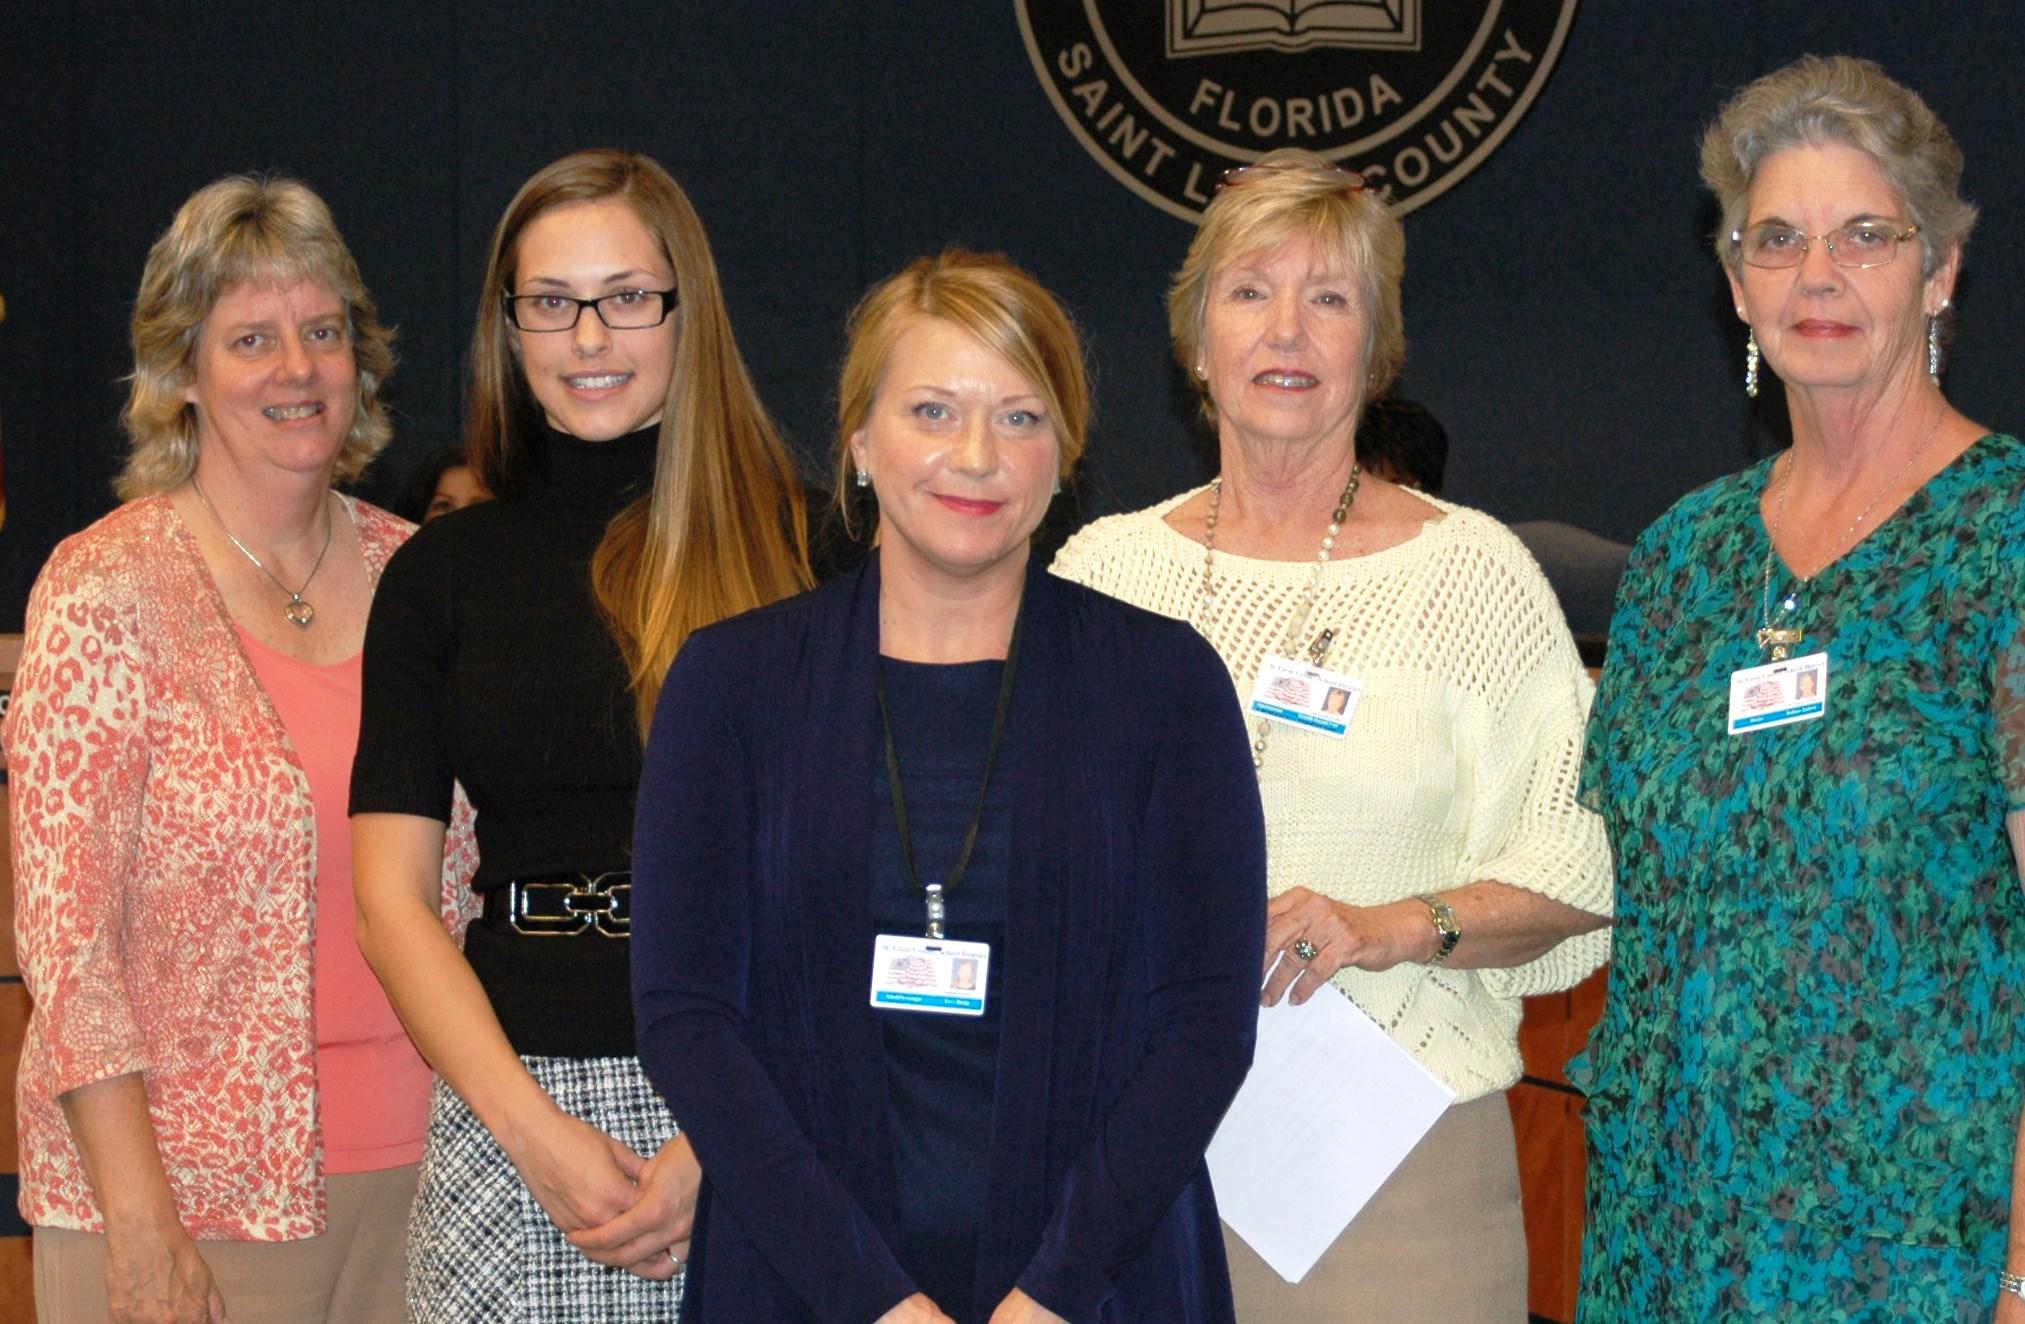 School psychologists recognized by school board